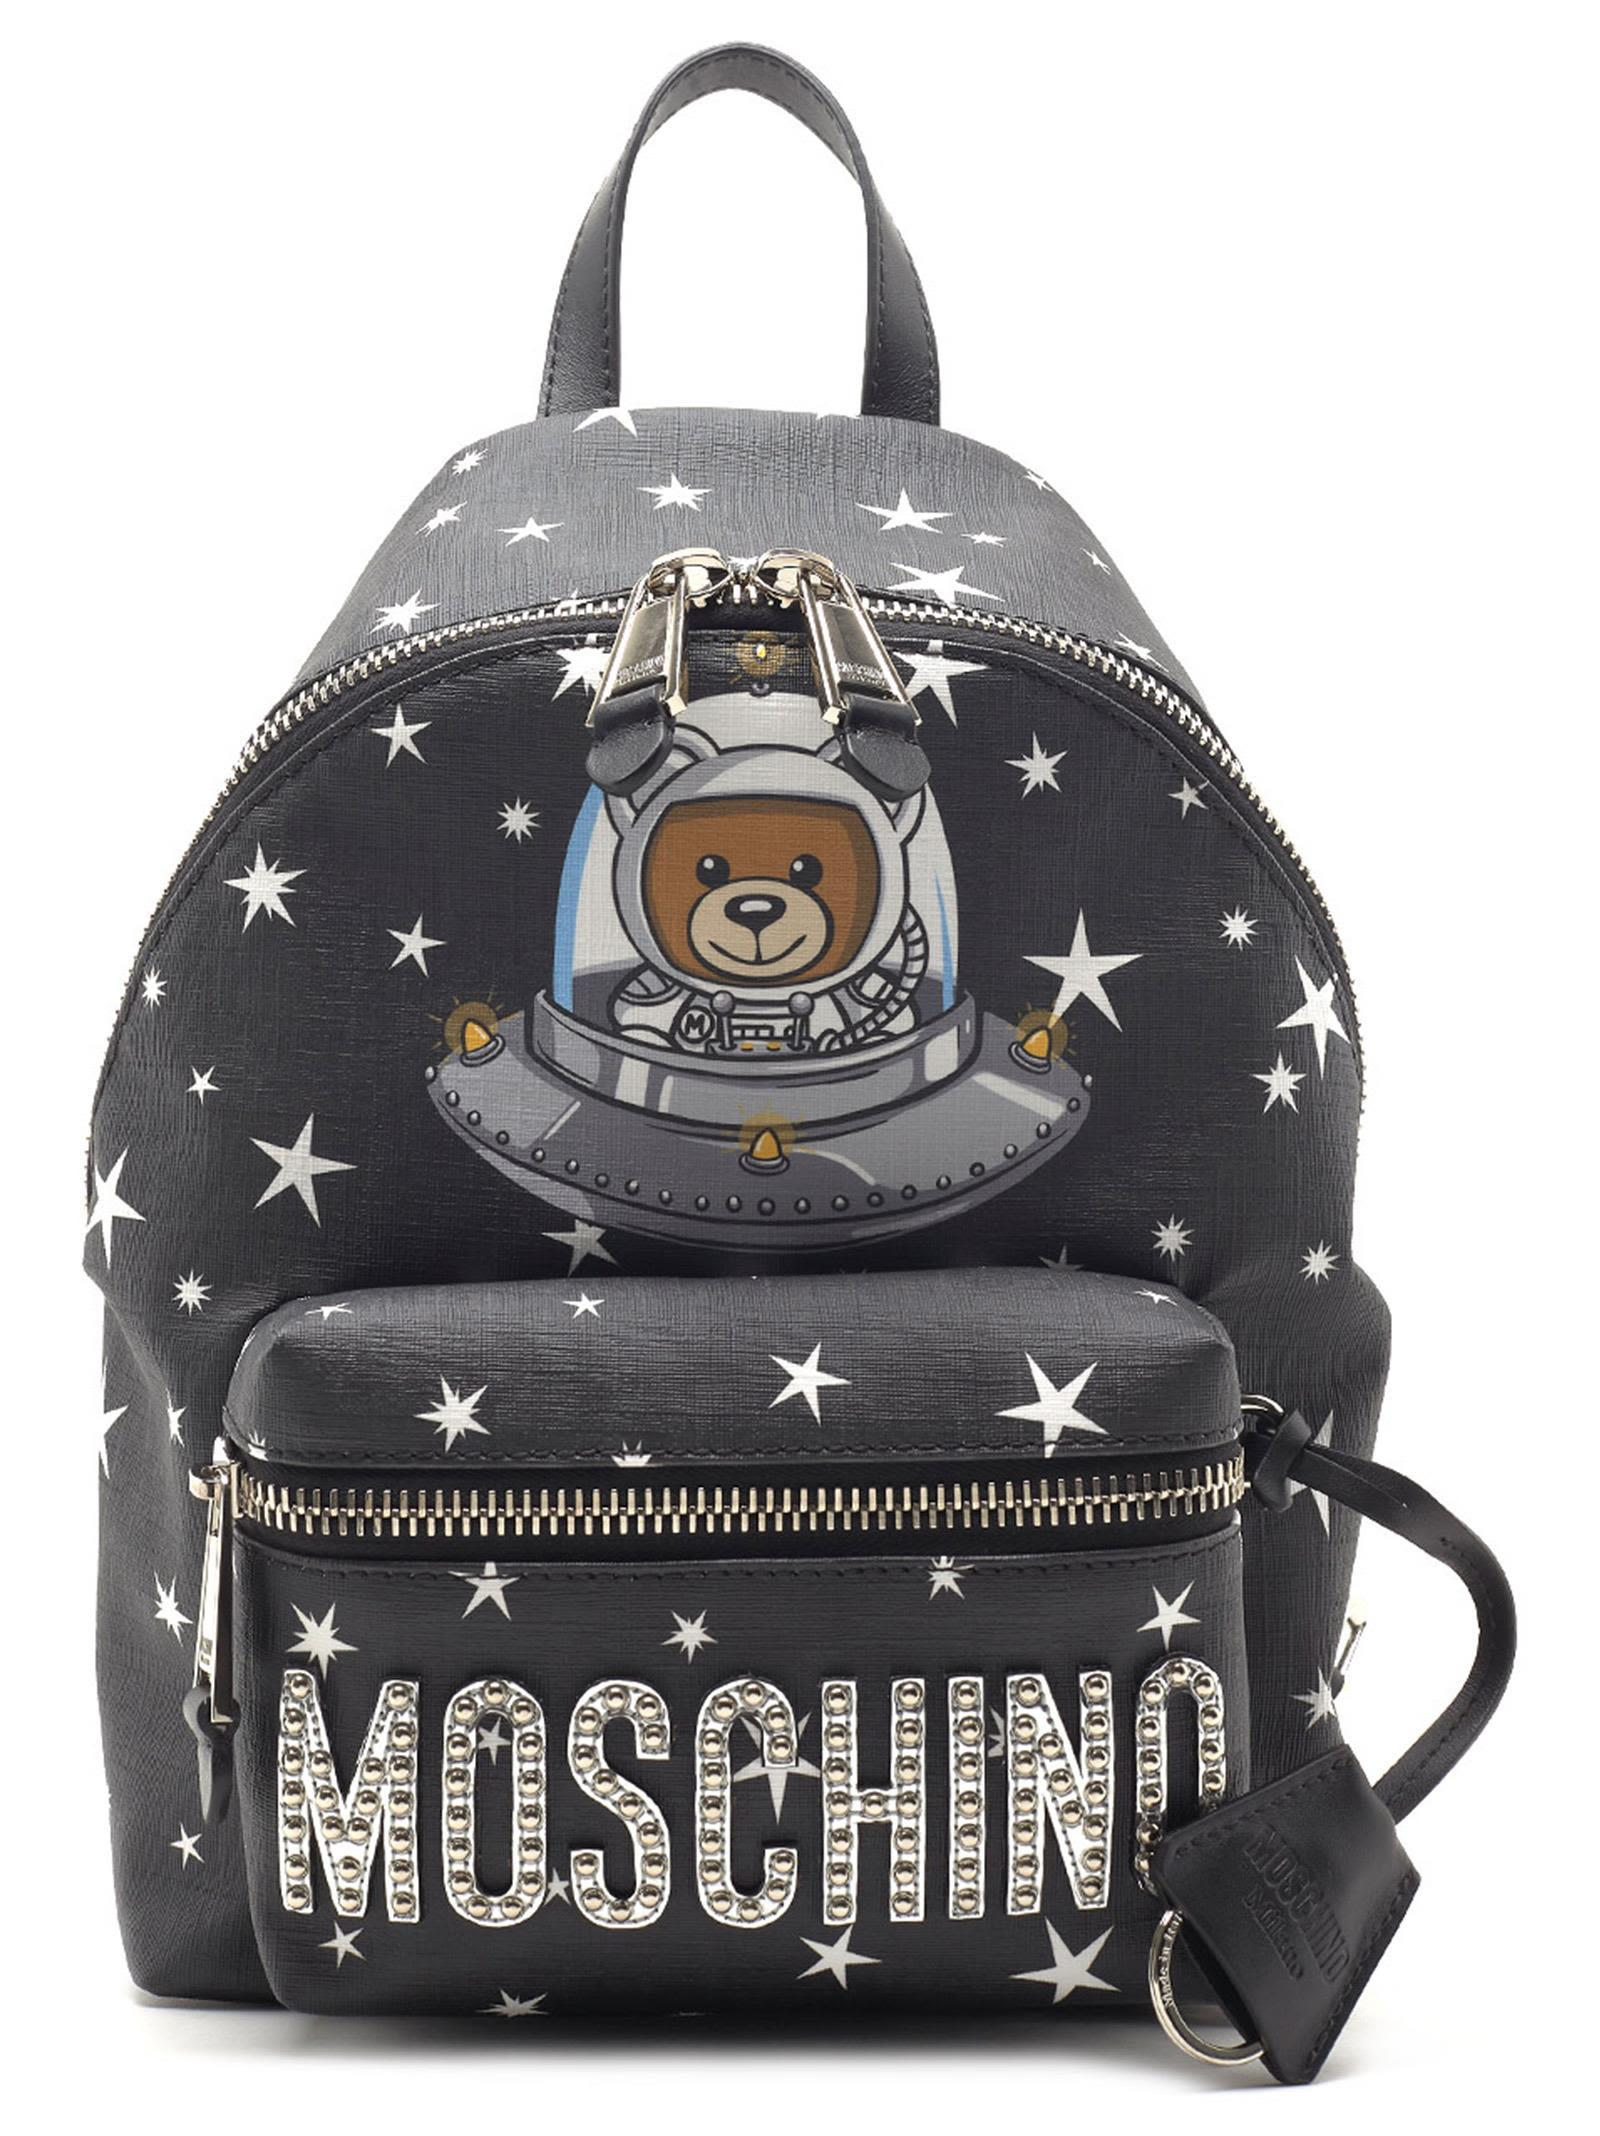 Moschino 'teddy Ufo' Backpack In Black